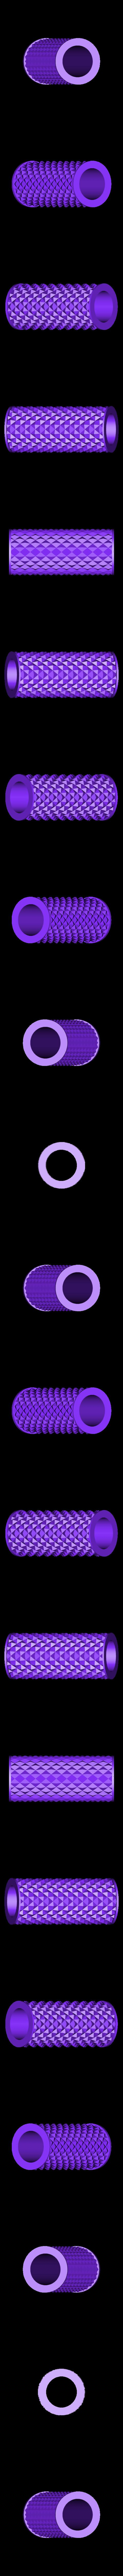 SirHa_Kurbel3.stl Télécharger fichier STL gratuit Air Raid Siren - hand crank version • Plan imprimable en 3D, MlePh